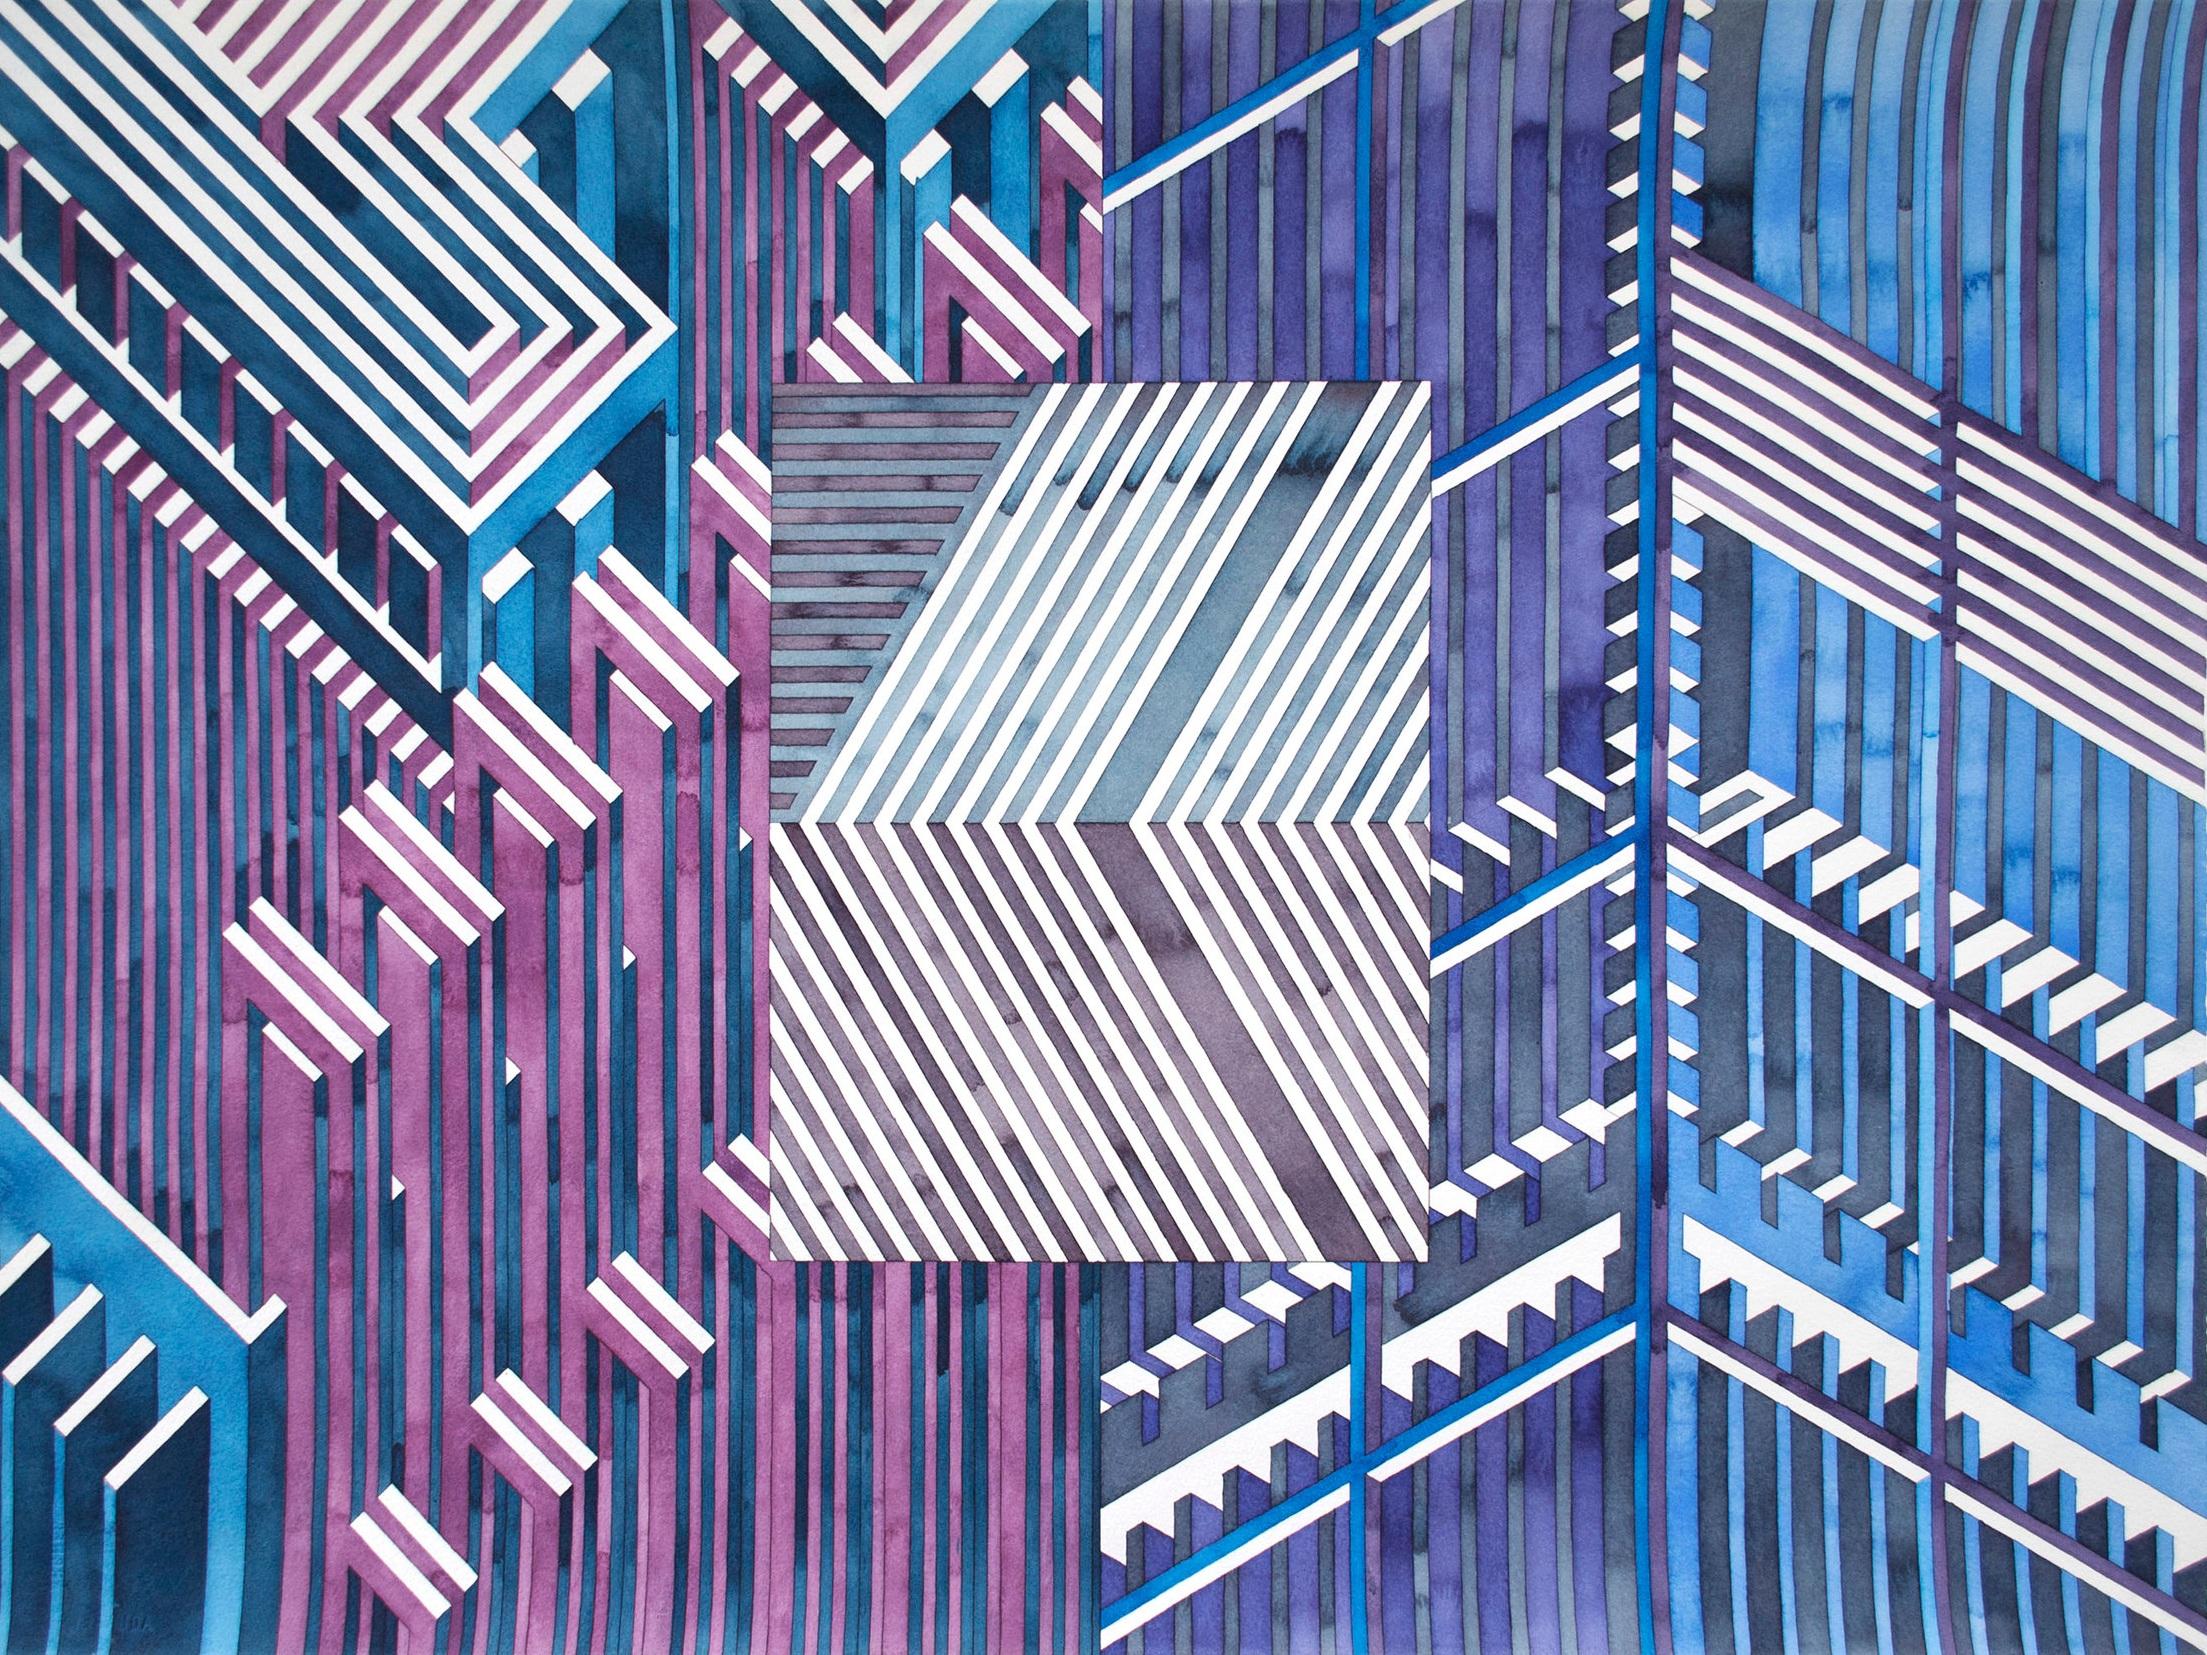 Facility 9, 2019  watercolor graphite on watercolor paper  22 x 30 inches